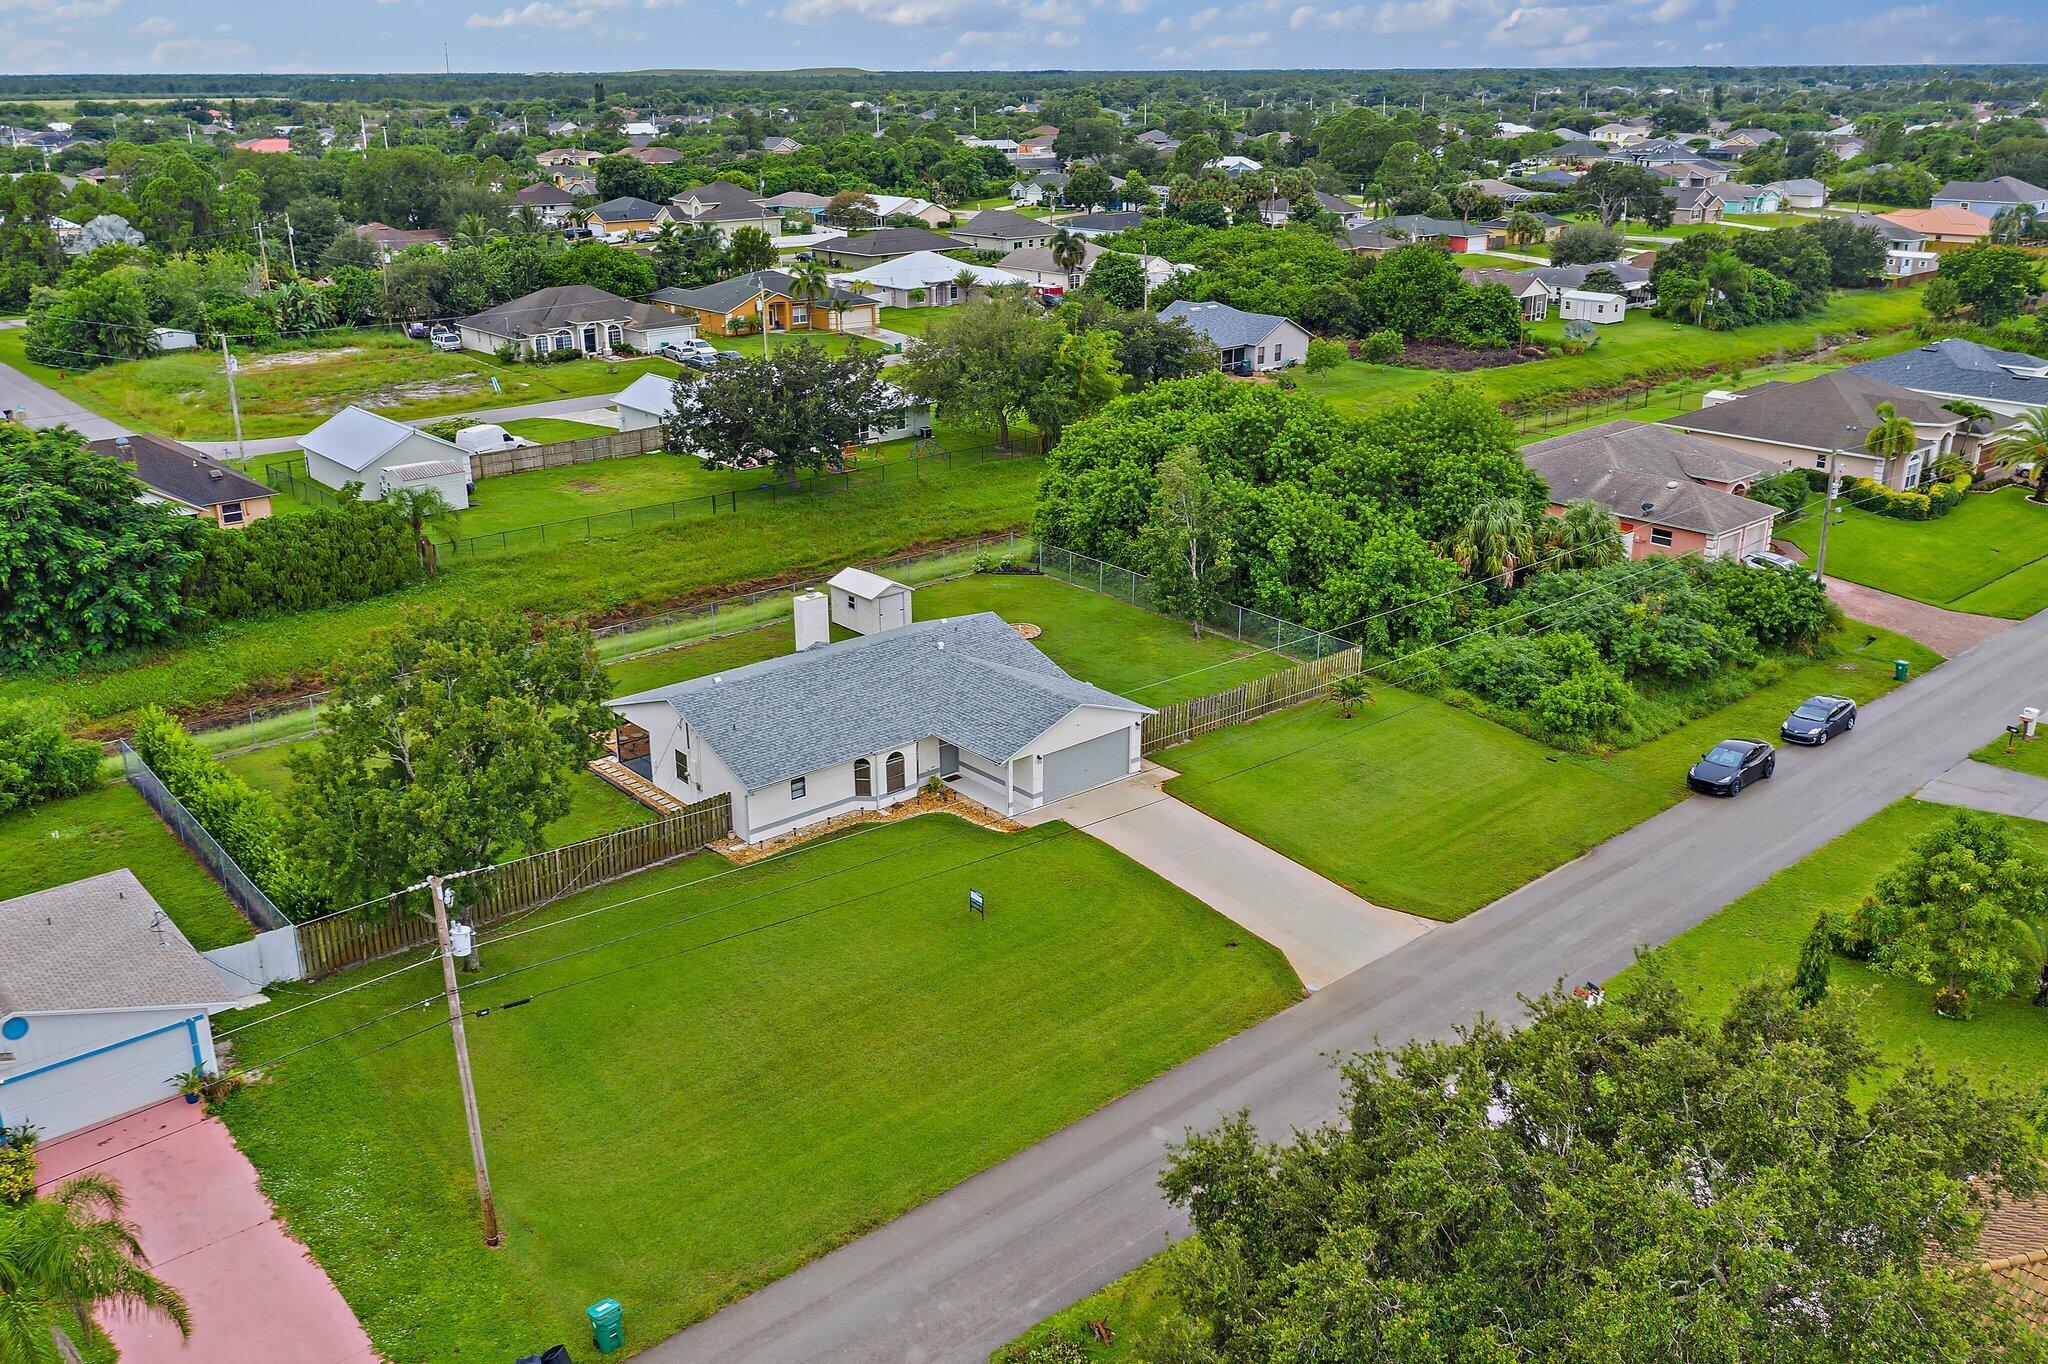 400 SW Undallo Road - 34953 - FL - Port Saint Lucie